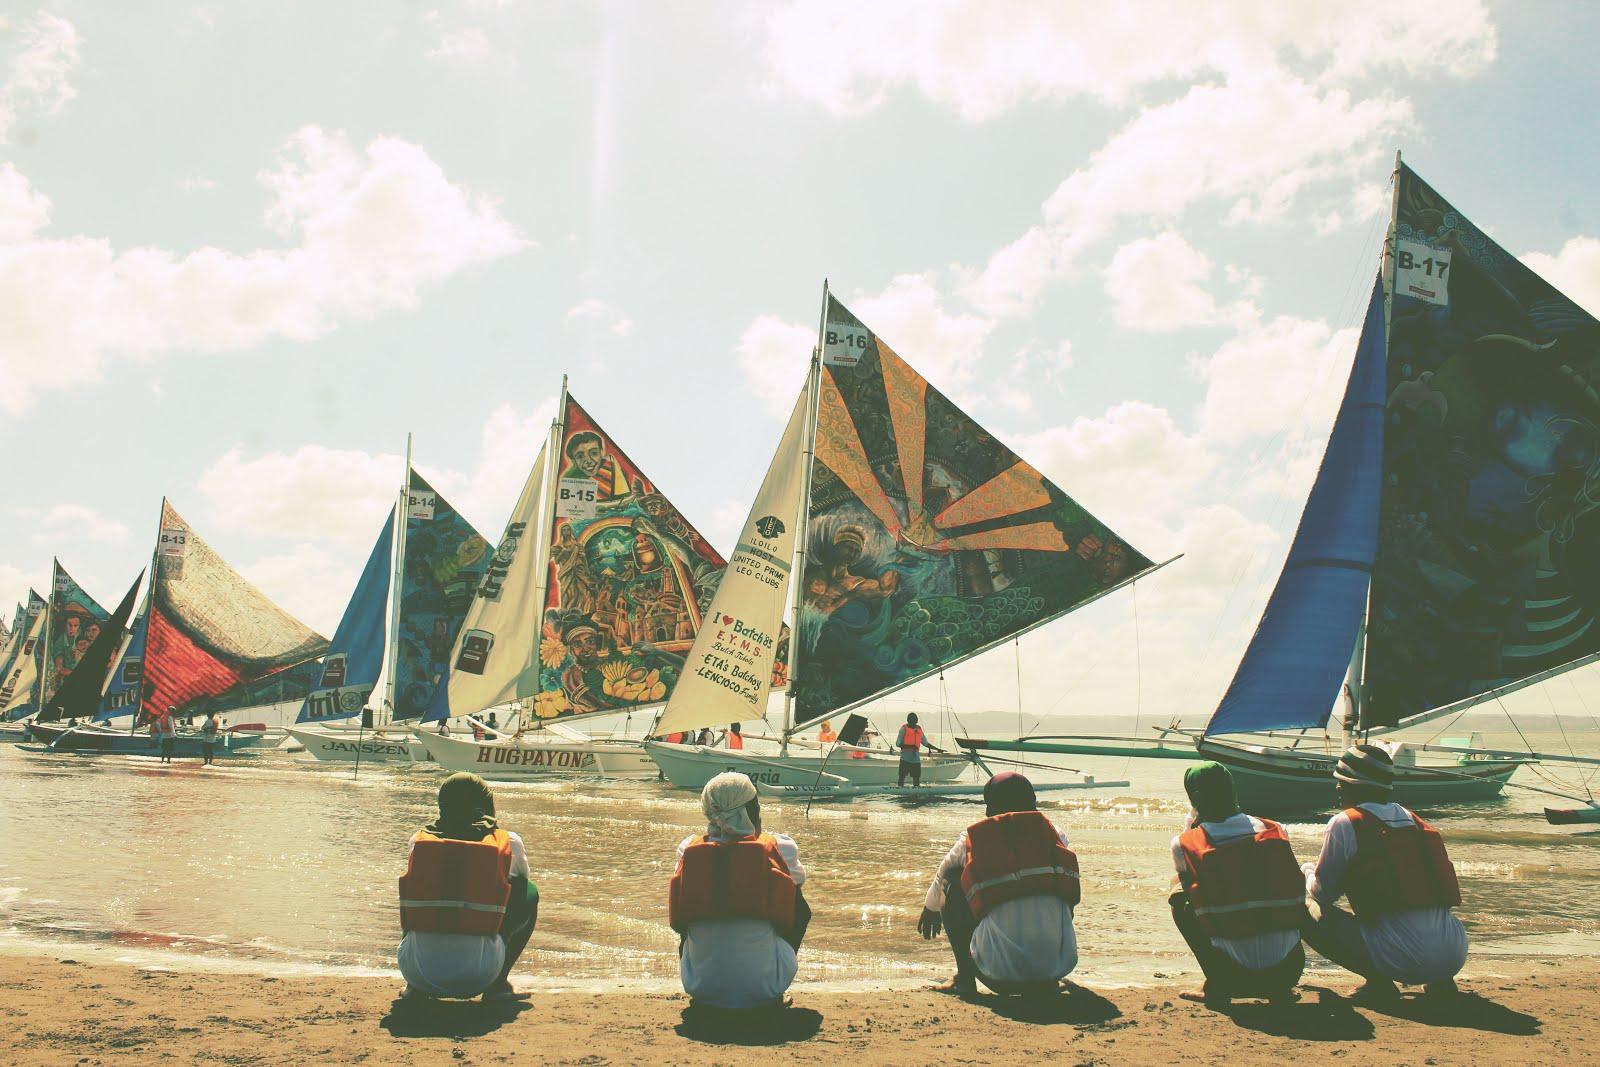 Iloilo Paraw Regatta Festival celebrates its 44th year Art, Creative, Creativity, Culture, Iloilo, Heritage, Ilonggo, Inspiration, Panay, Philippines, Paraw Regatta Festival, Sand, Sun, Sails, Layag, Race, Paraw